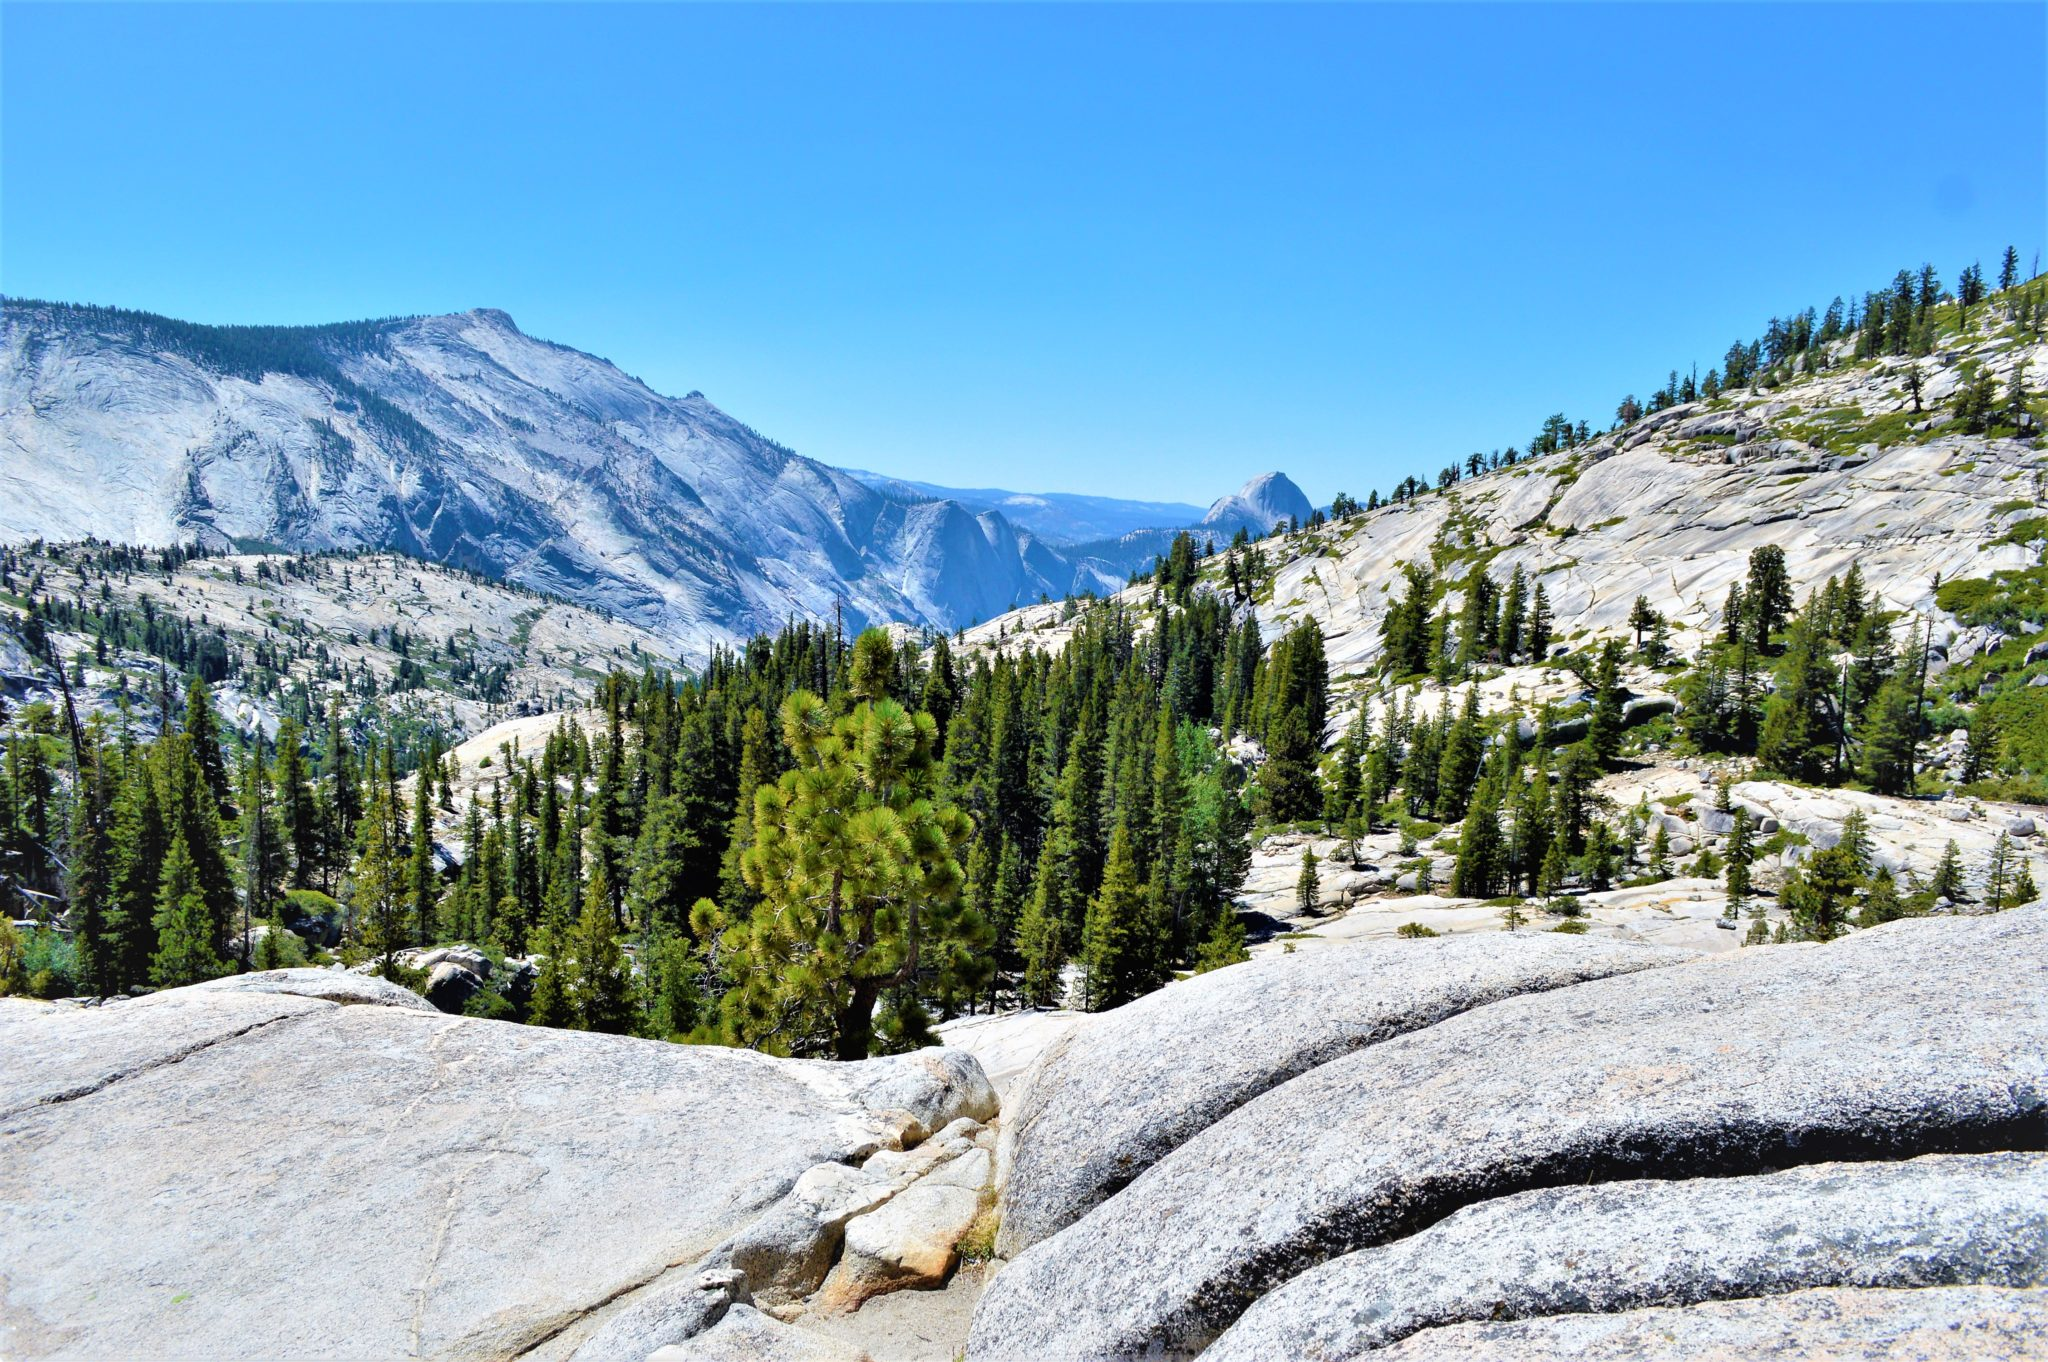 Mountains at Yosemite National Park, California